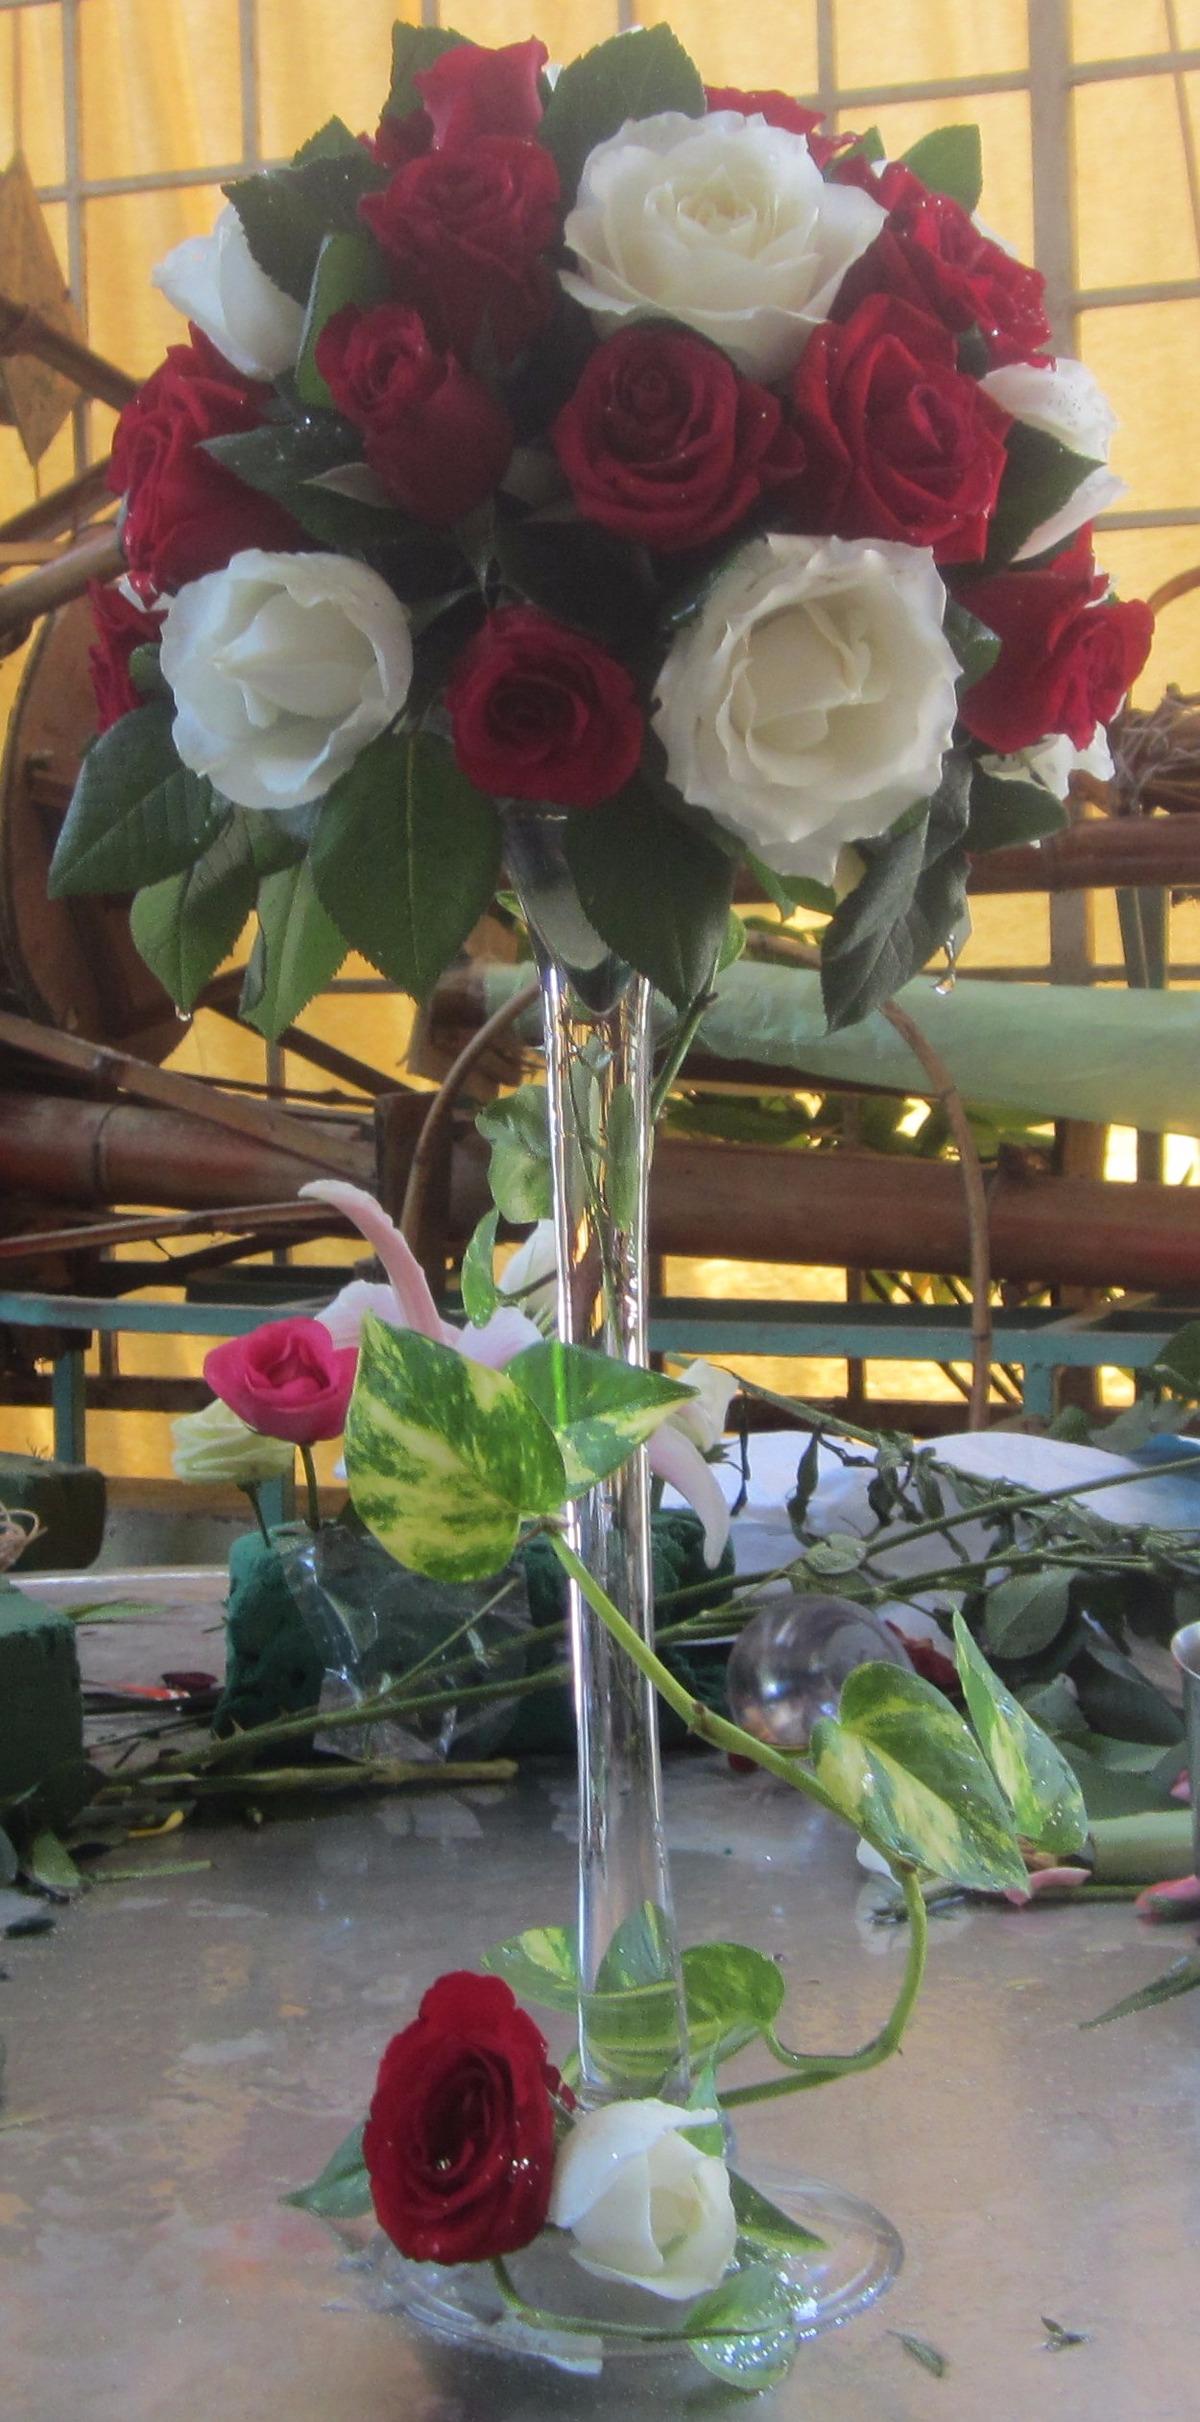 Shop hoa Hội An, Quảng Nam - Shop Hoa Kim Loan - Dịch vụ hoa tươi